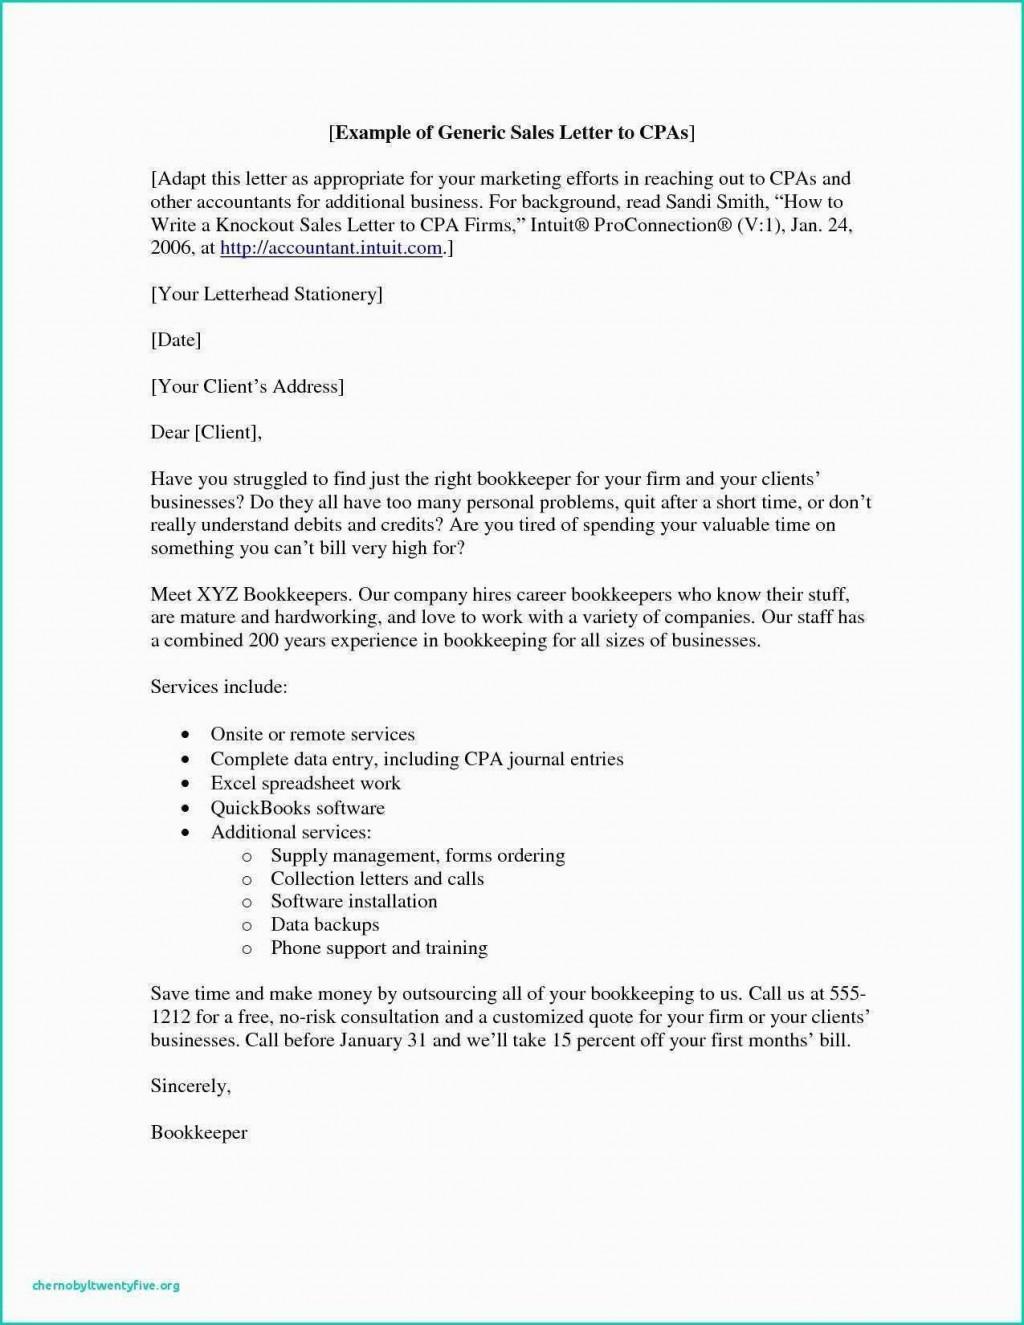 005 Stupendou Real Estate Marketing Letter Template Image  TemplatesLarge